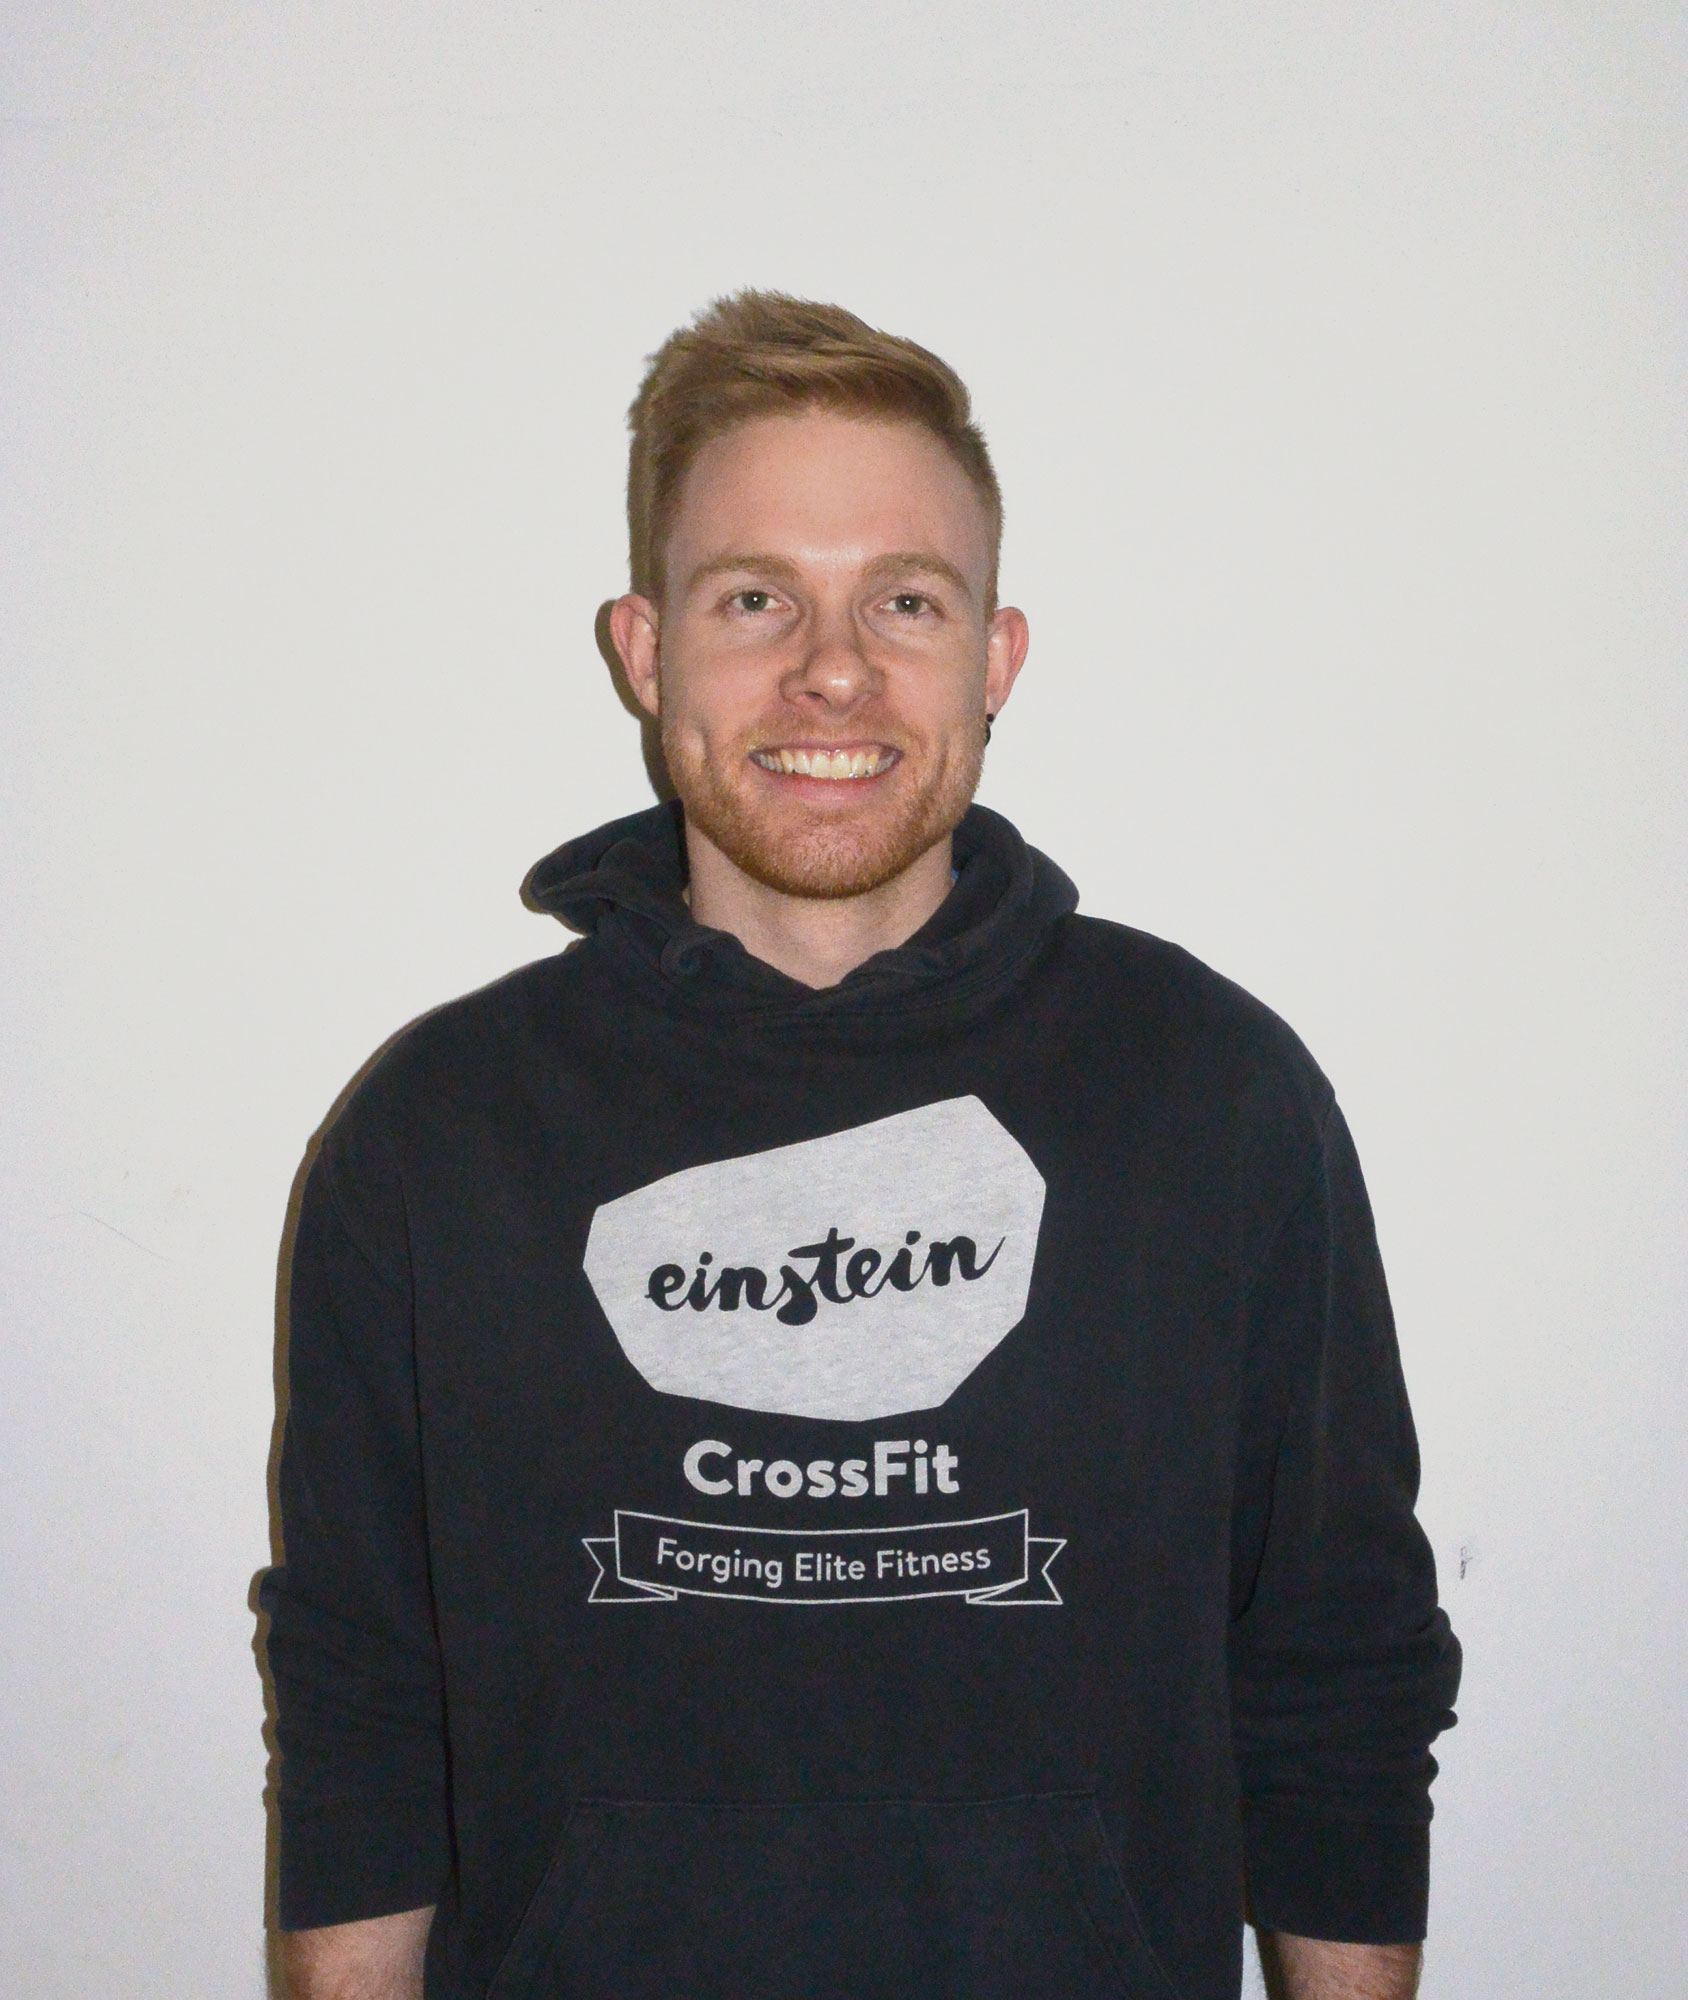 Unser CrossFitCoach Tobi